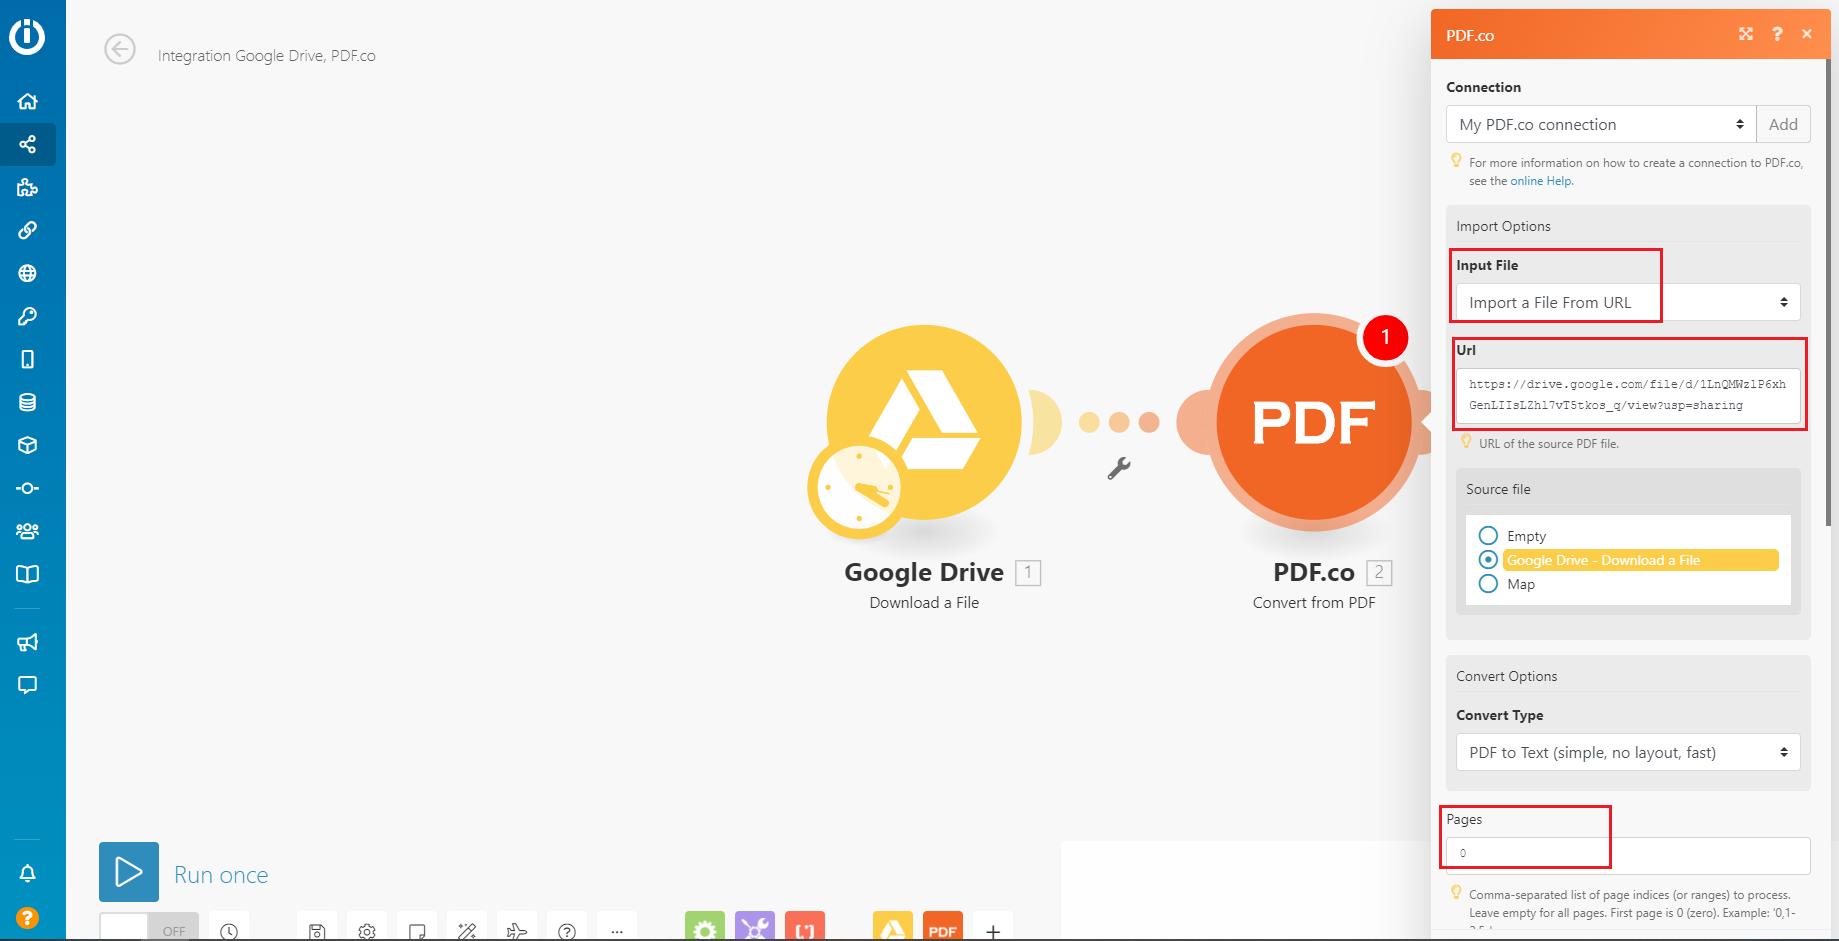 PDF.co Account